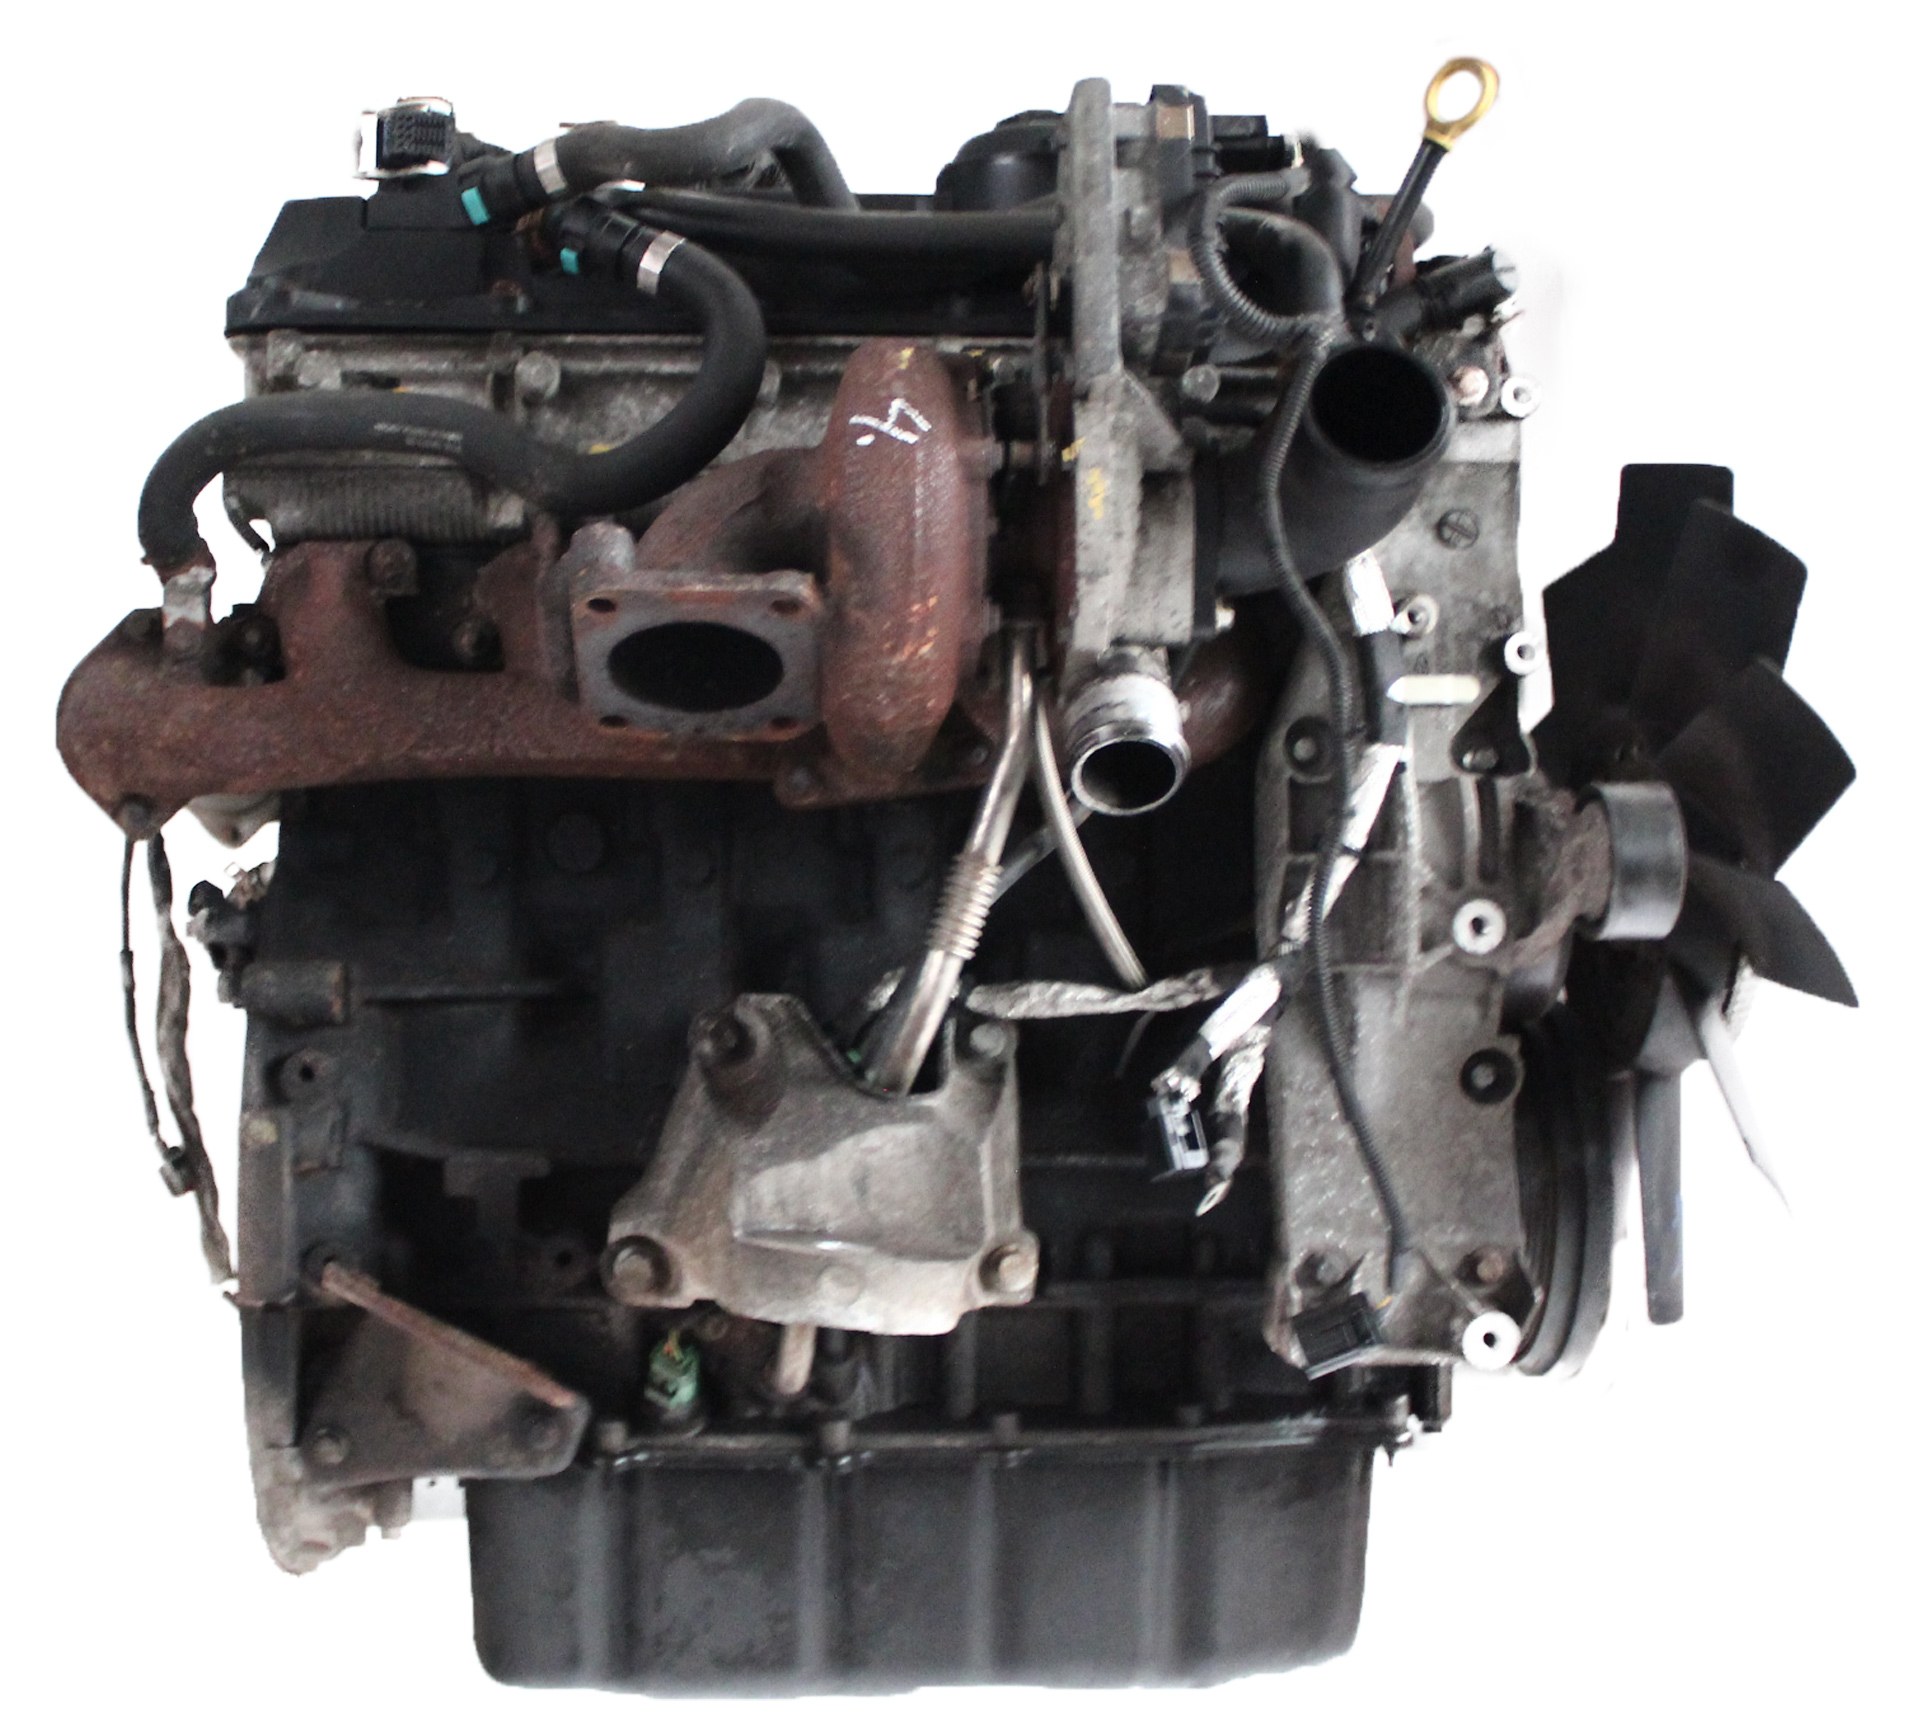 Motor 2008 Ford Transit FD 3,2 TDCi Diesel SAFA SAFB 200 PS mit Anbauteilen